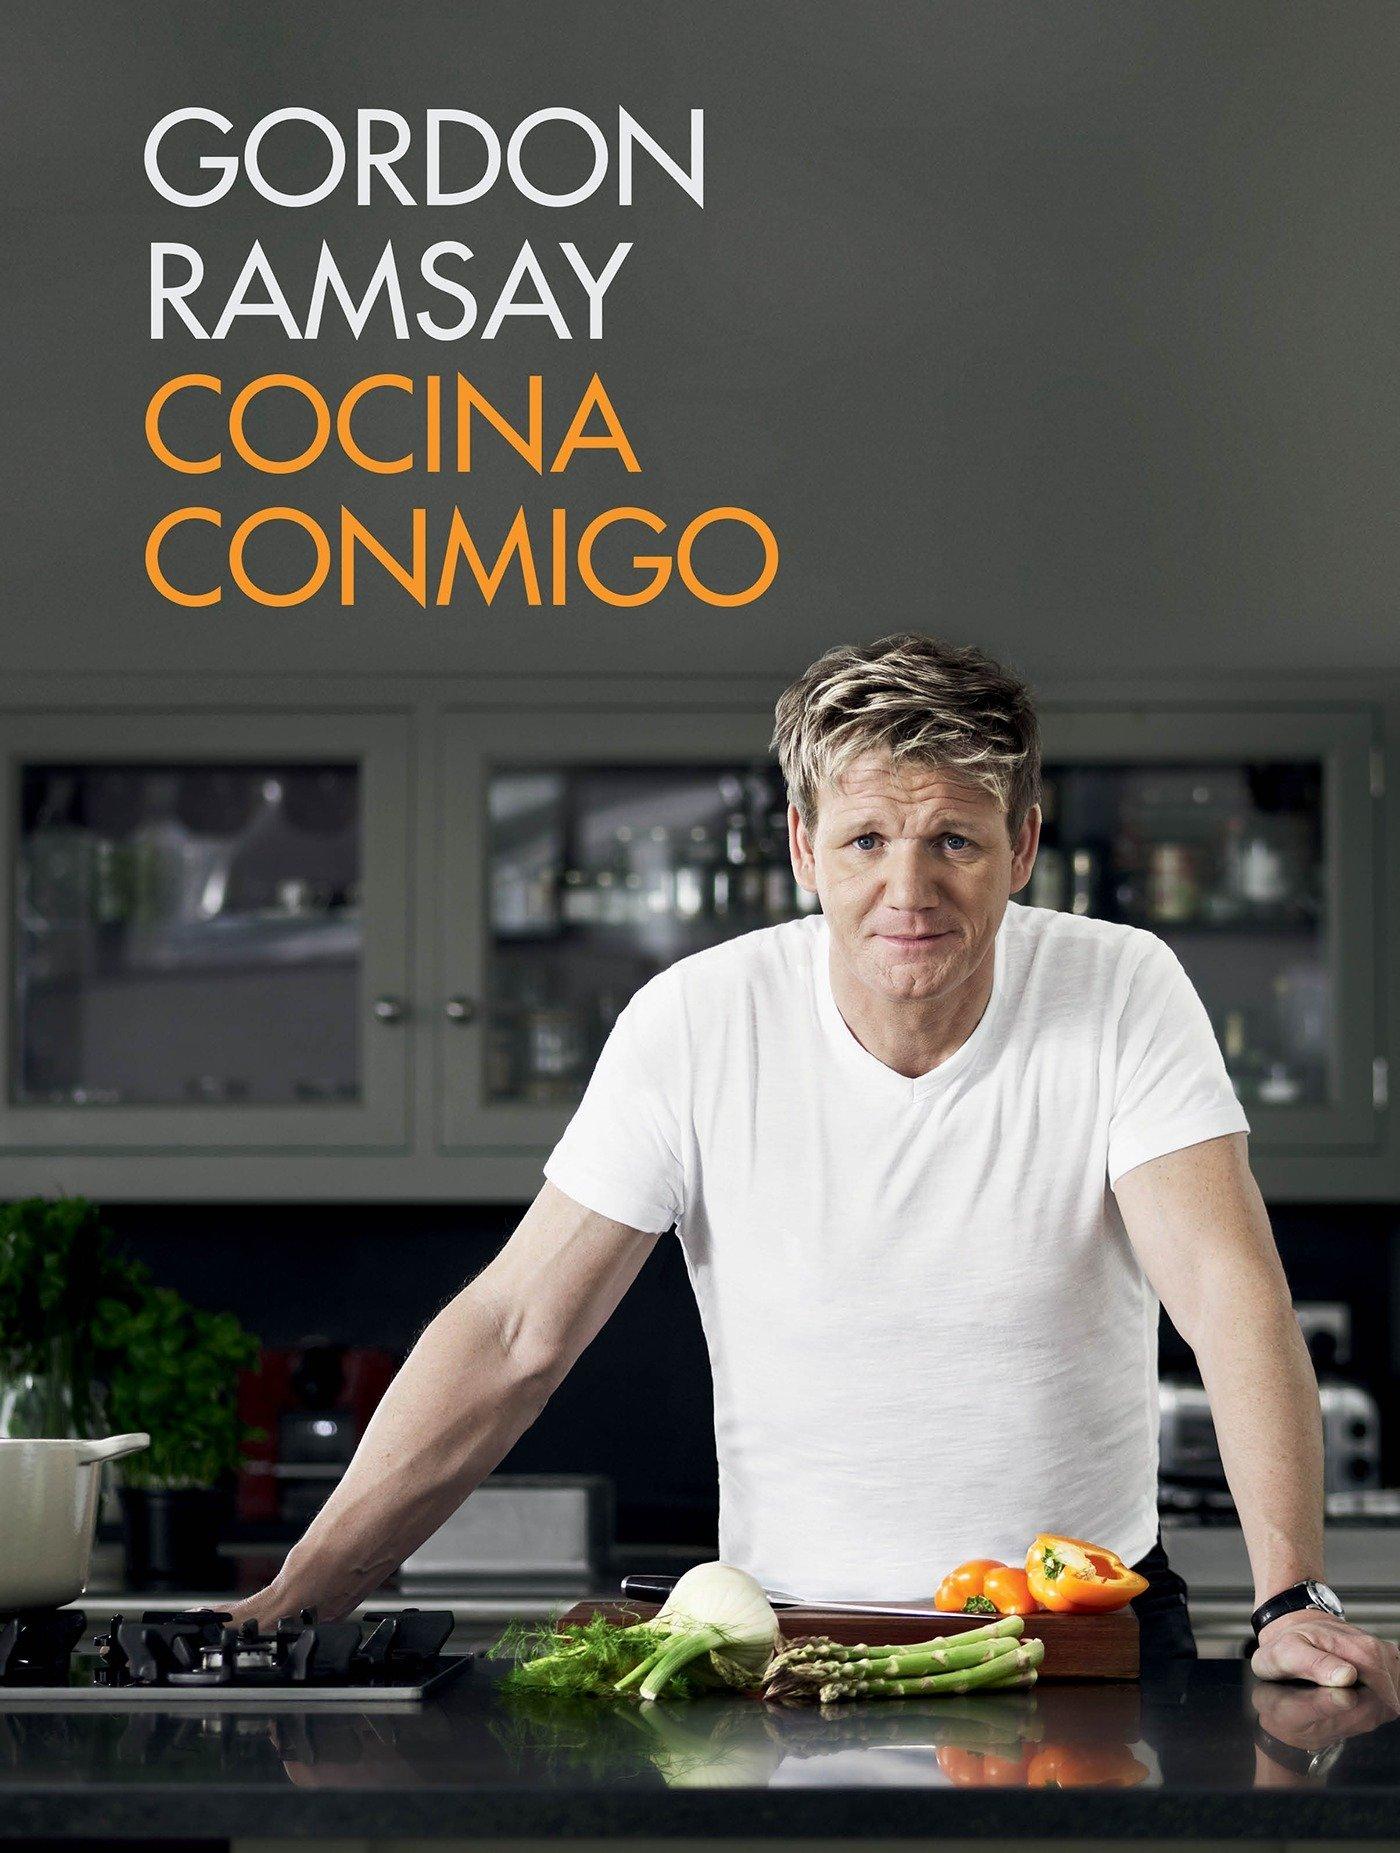 Cocina conmigo / Gordon Ramsay's Home Cooking: Everything You Need to Know to Ma ke Fabulous Food (Spanish Edition) by Grijalbo Ilustrados